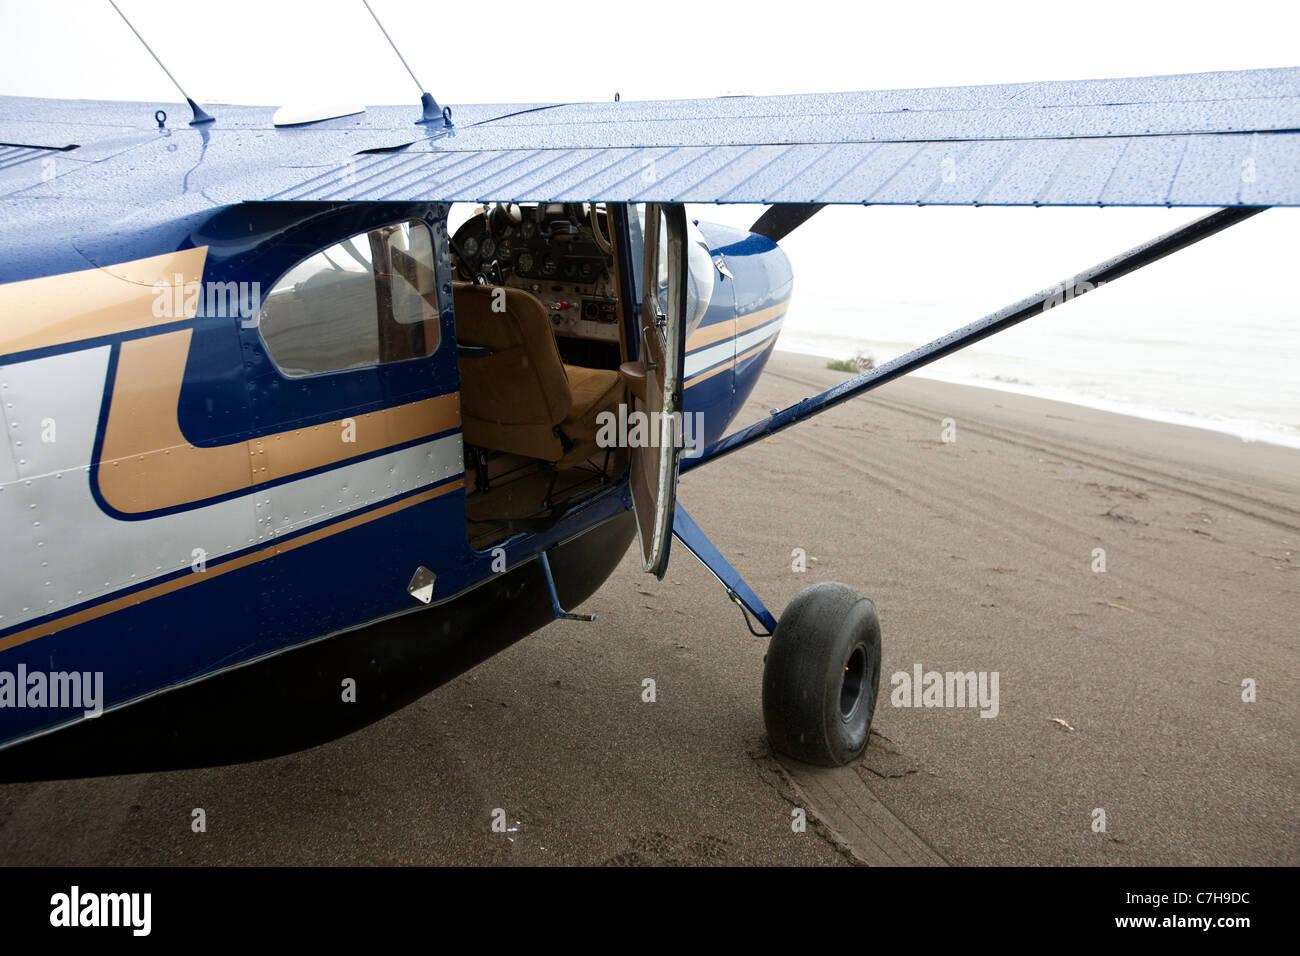 Prop plane parked on a sandy beach, Lake Clark National Park near Silver Salmon Creek Lodge, Alaska, United States - Stock Image